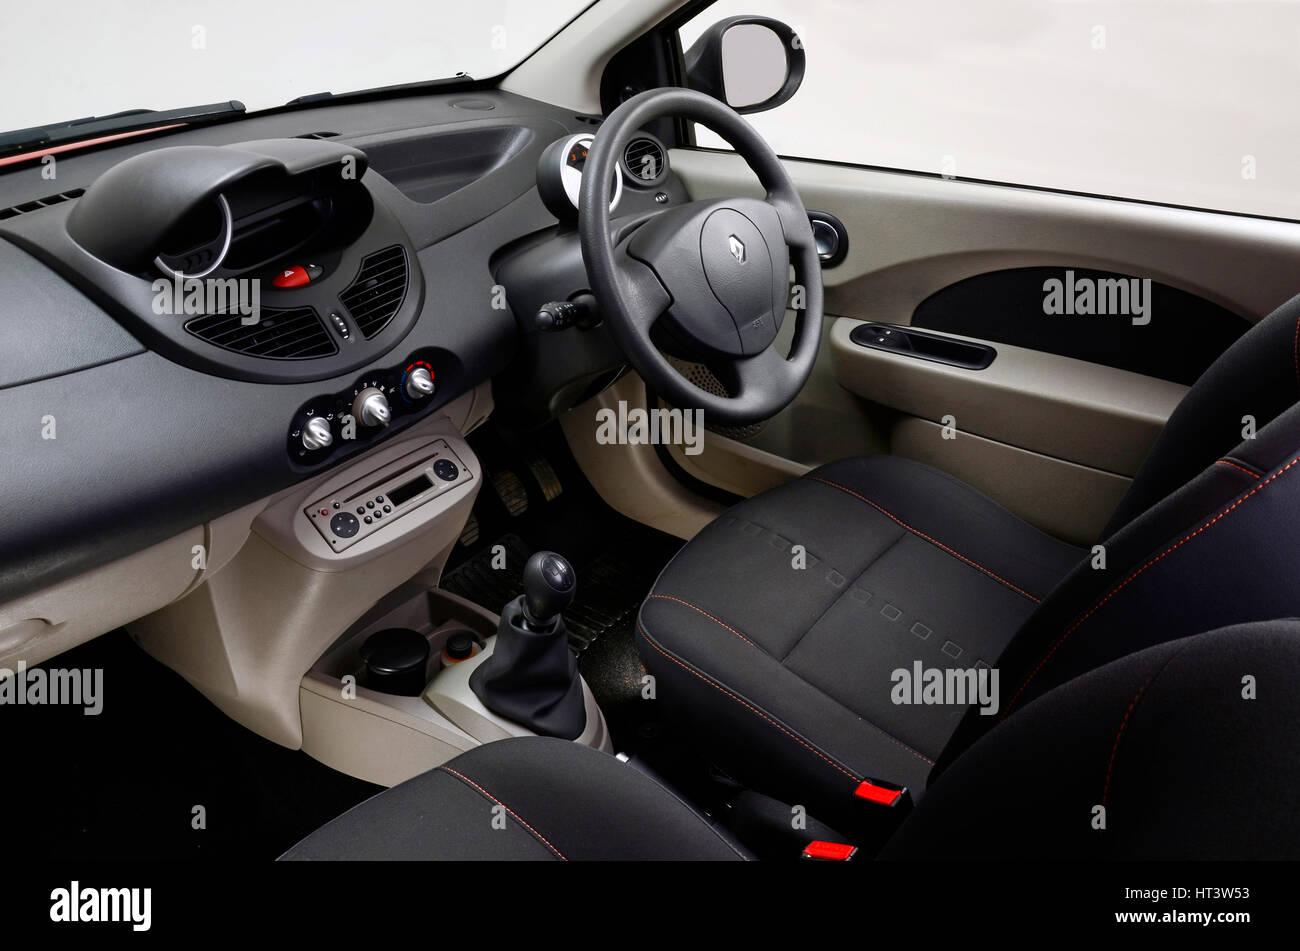 Renault Twingo Stock Photos & Renault Twingo Stock Images